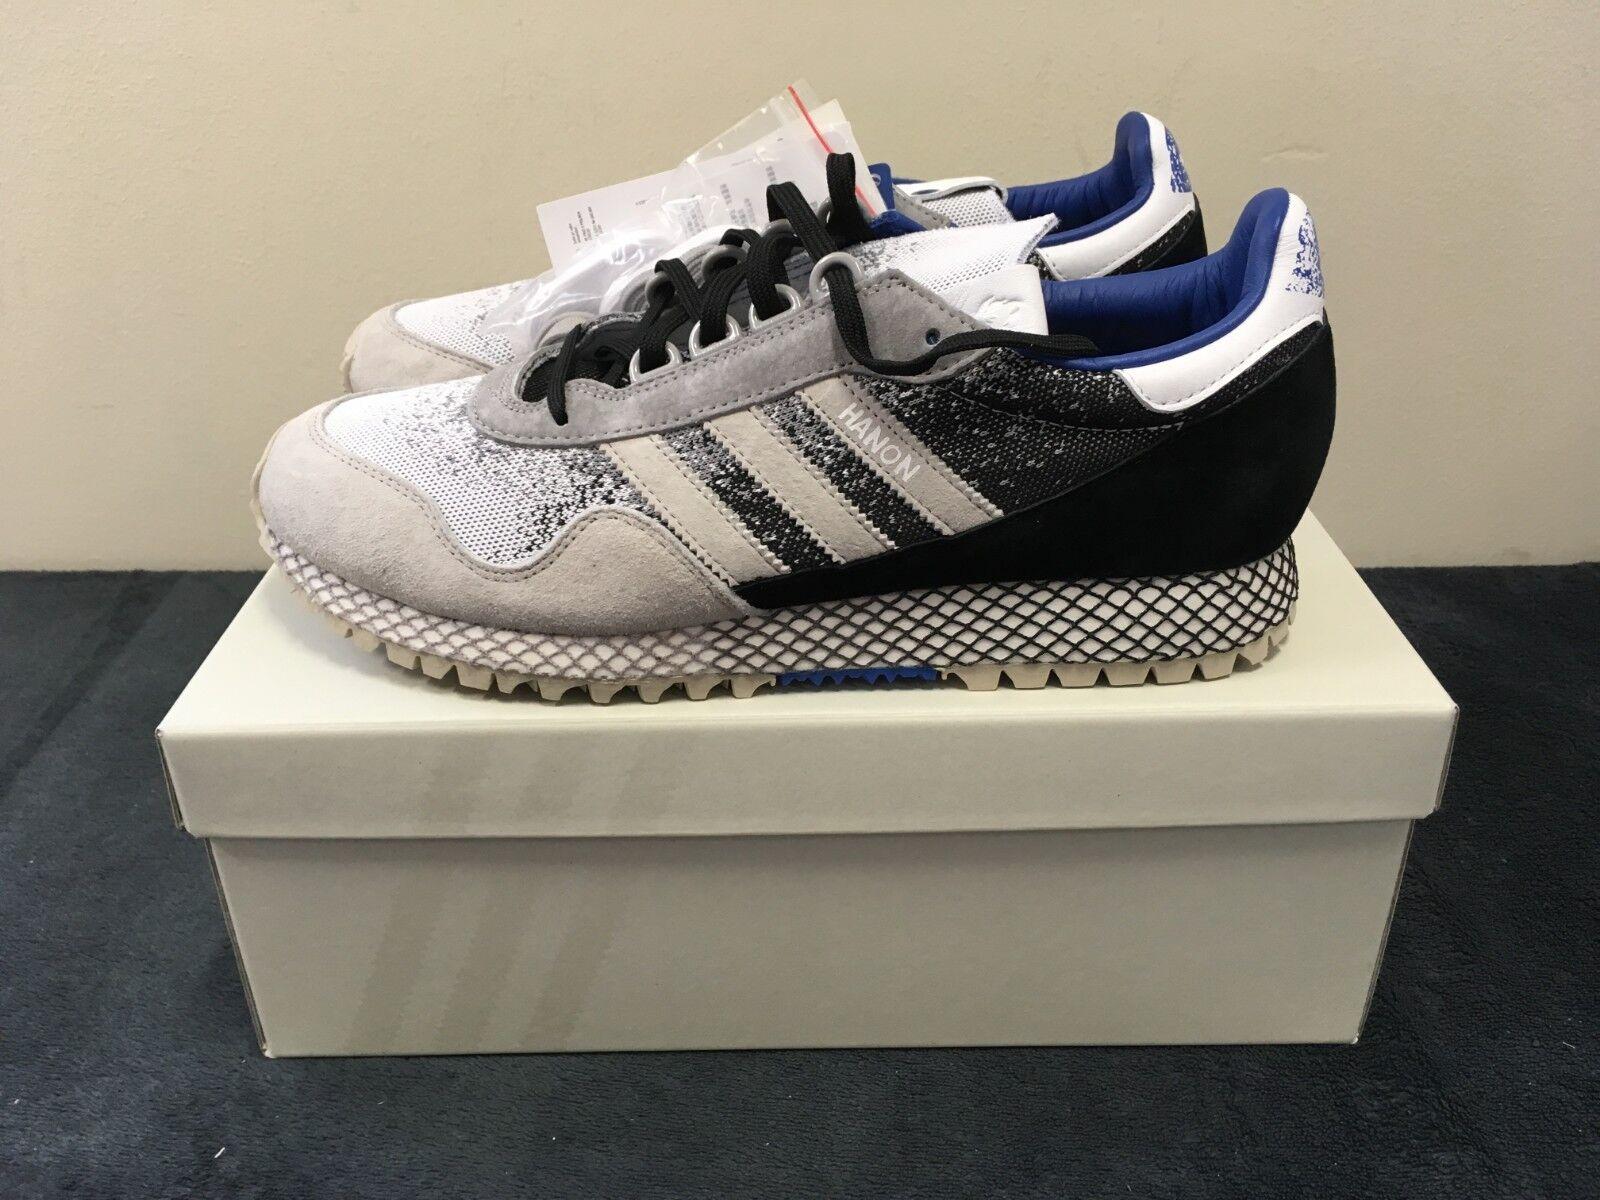 Adidas X HANON-New HANON-New HANON-New York-DARK STORM-consortium-US 10 bbead2